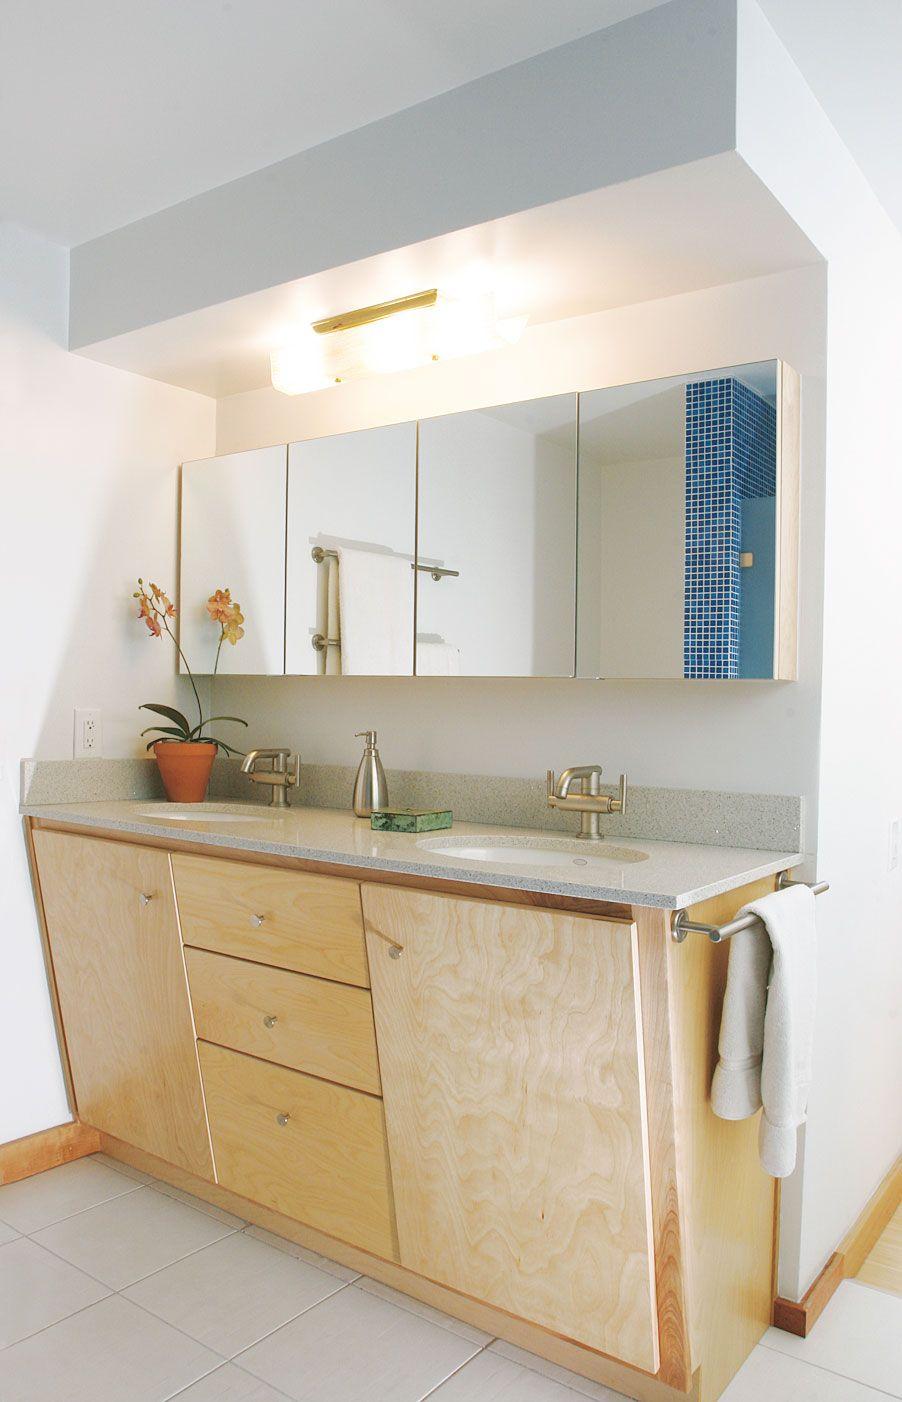 Modern Slant Front Vanity Mid Mod Bathroom Remodel Retro Bathrooms [ 1402 x 902 Pixel ]